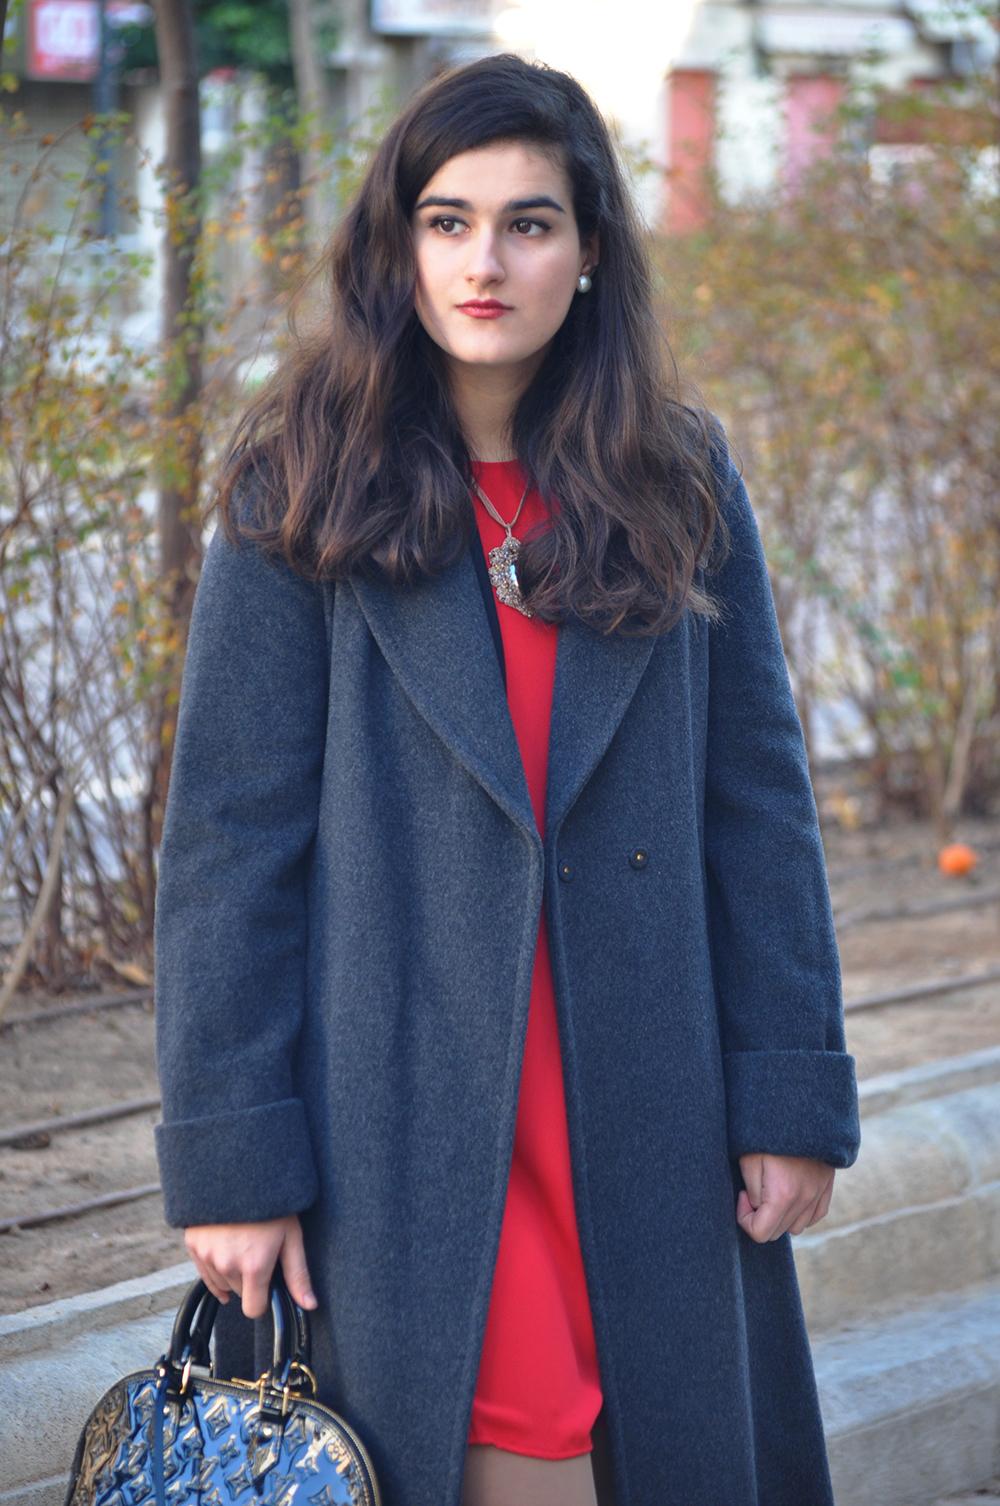 something fashion blogger valencia spain, amanda r. red hm blazer new year's eve louis vuitton bag alma vernis black fblogger, emporio armani shoes wrap coat streetstyle 2015